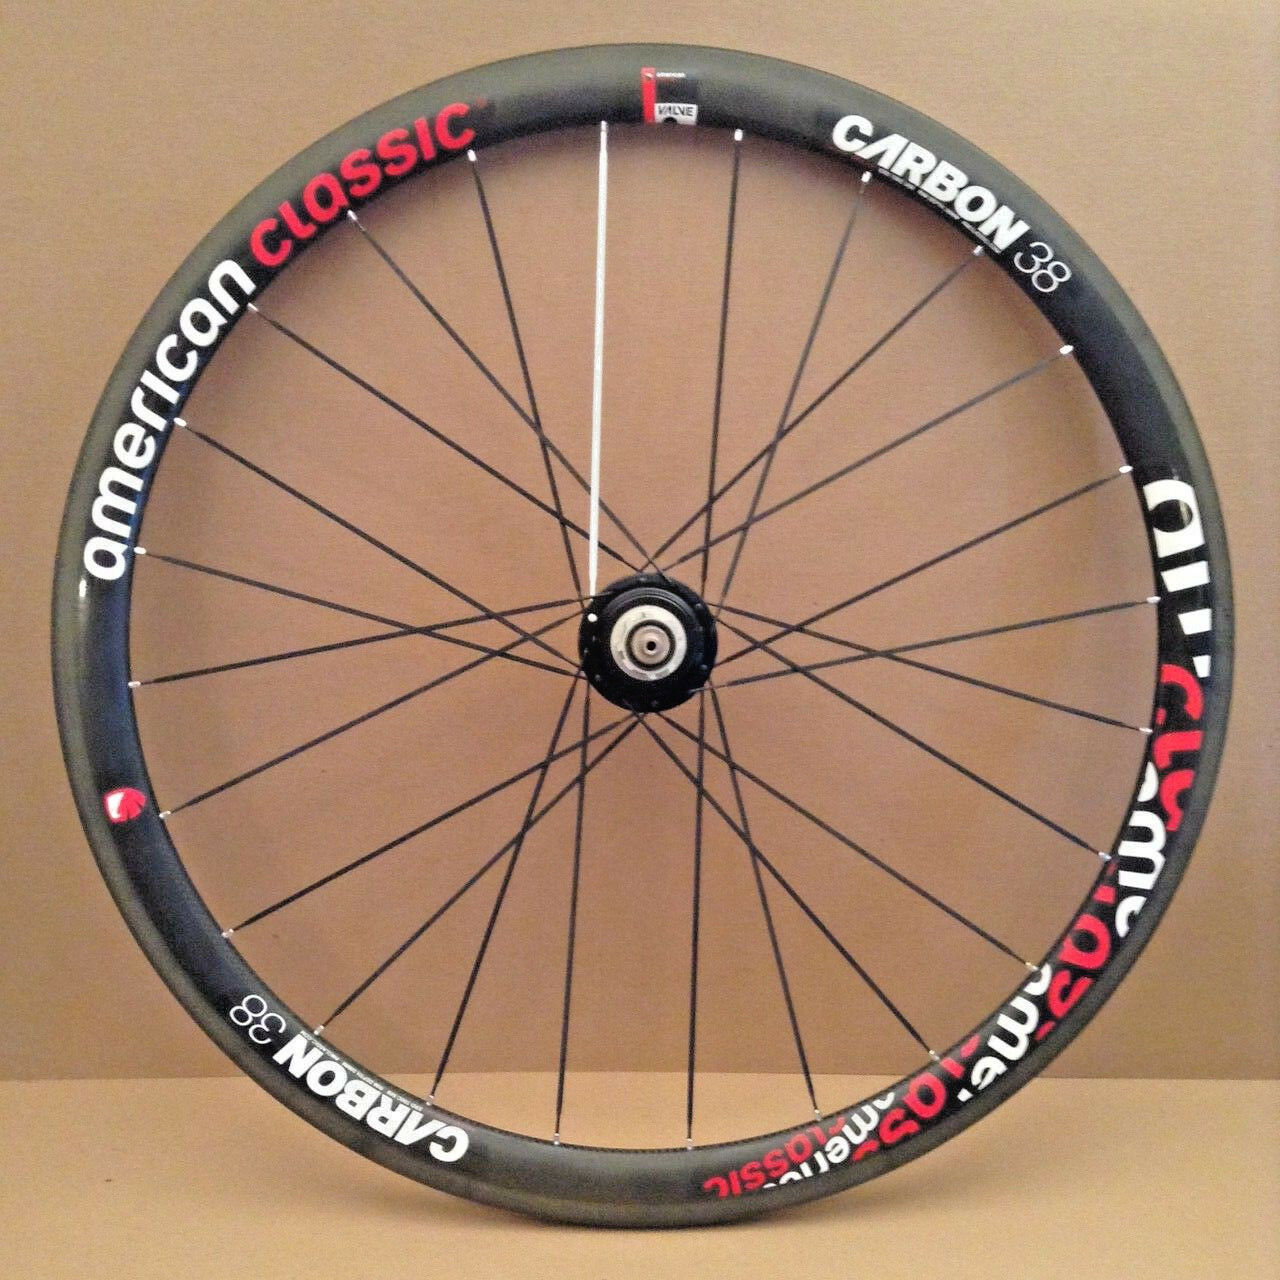 American Classic Carbon 38 Tubular Rear Wheel Campagnolo 9 10 11 Speed Freehub